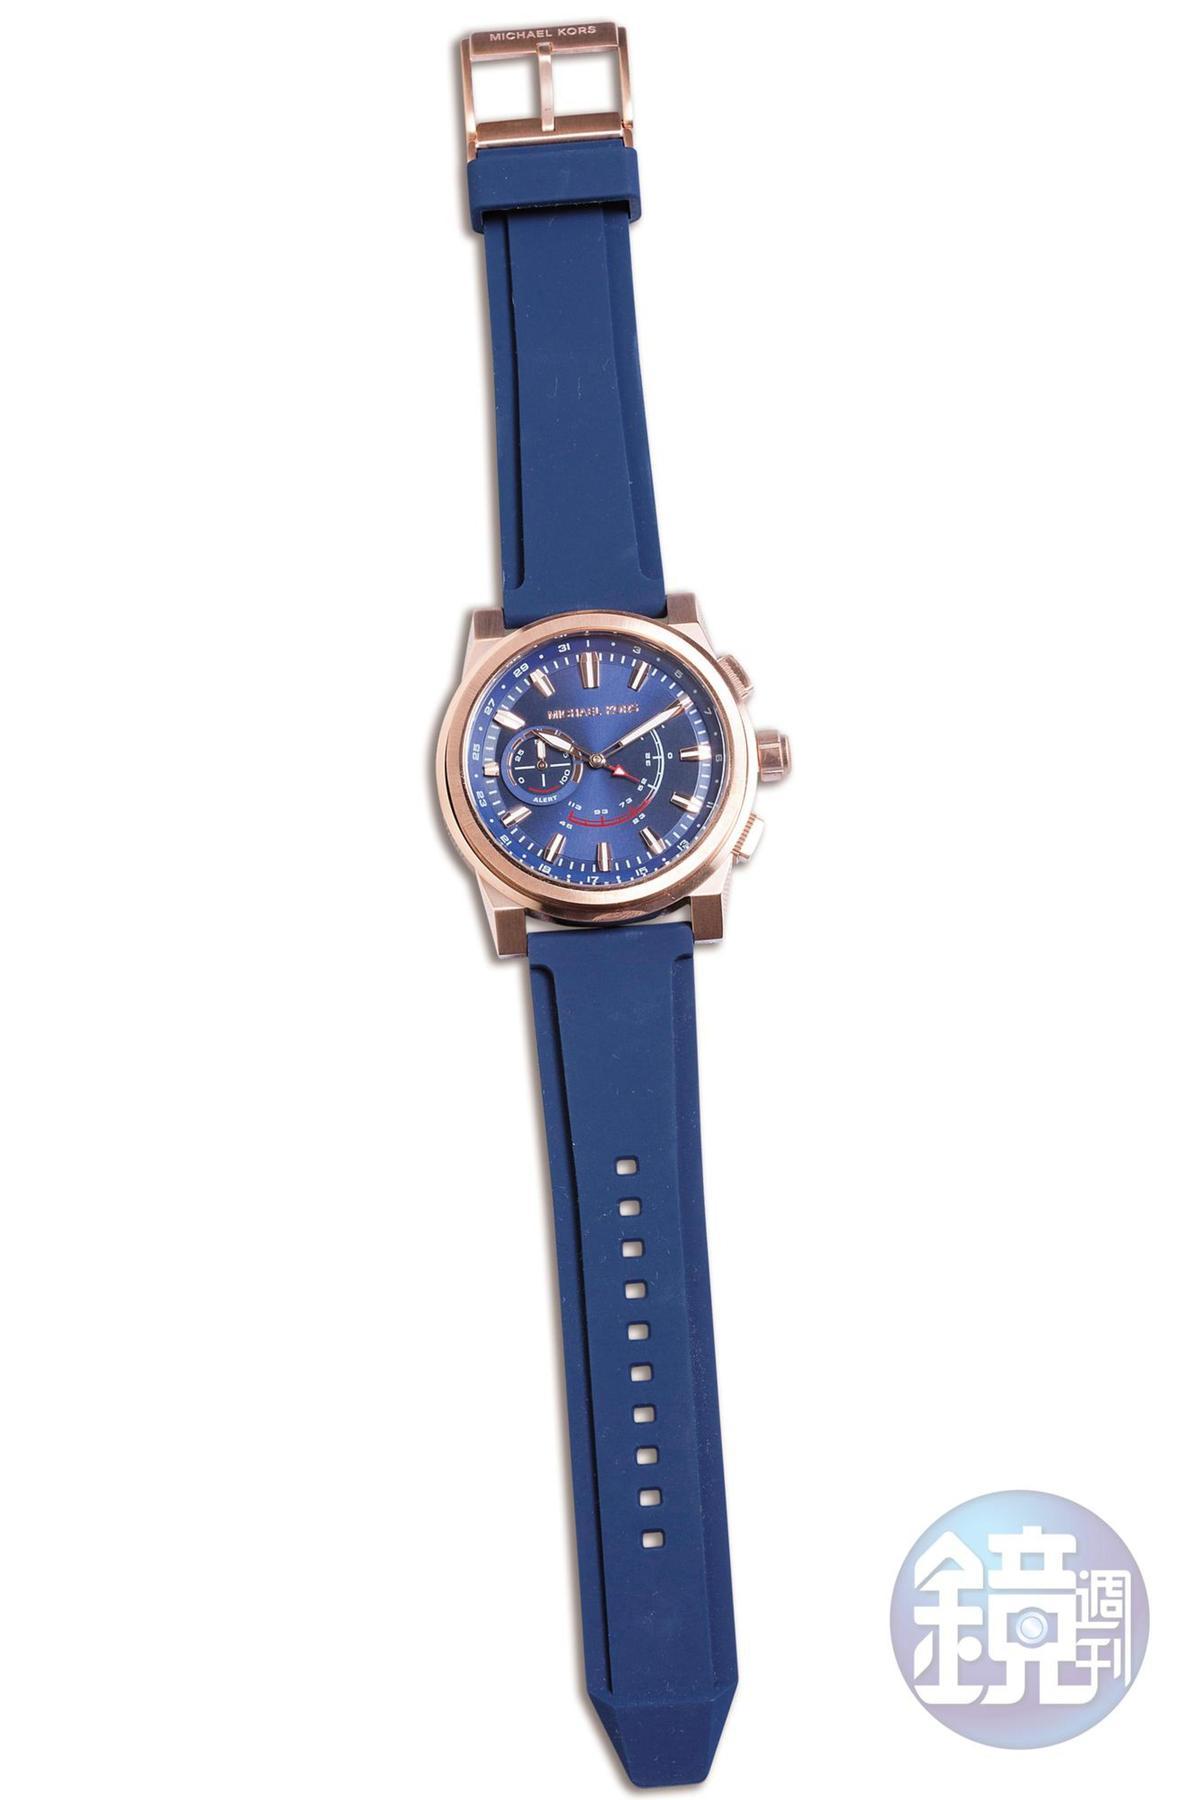 MICHAEL KORS藍色錶帶腕錶,NT$11,300。